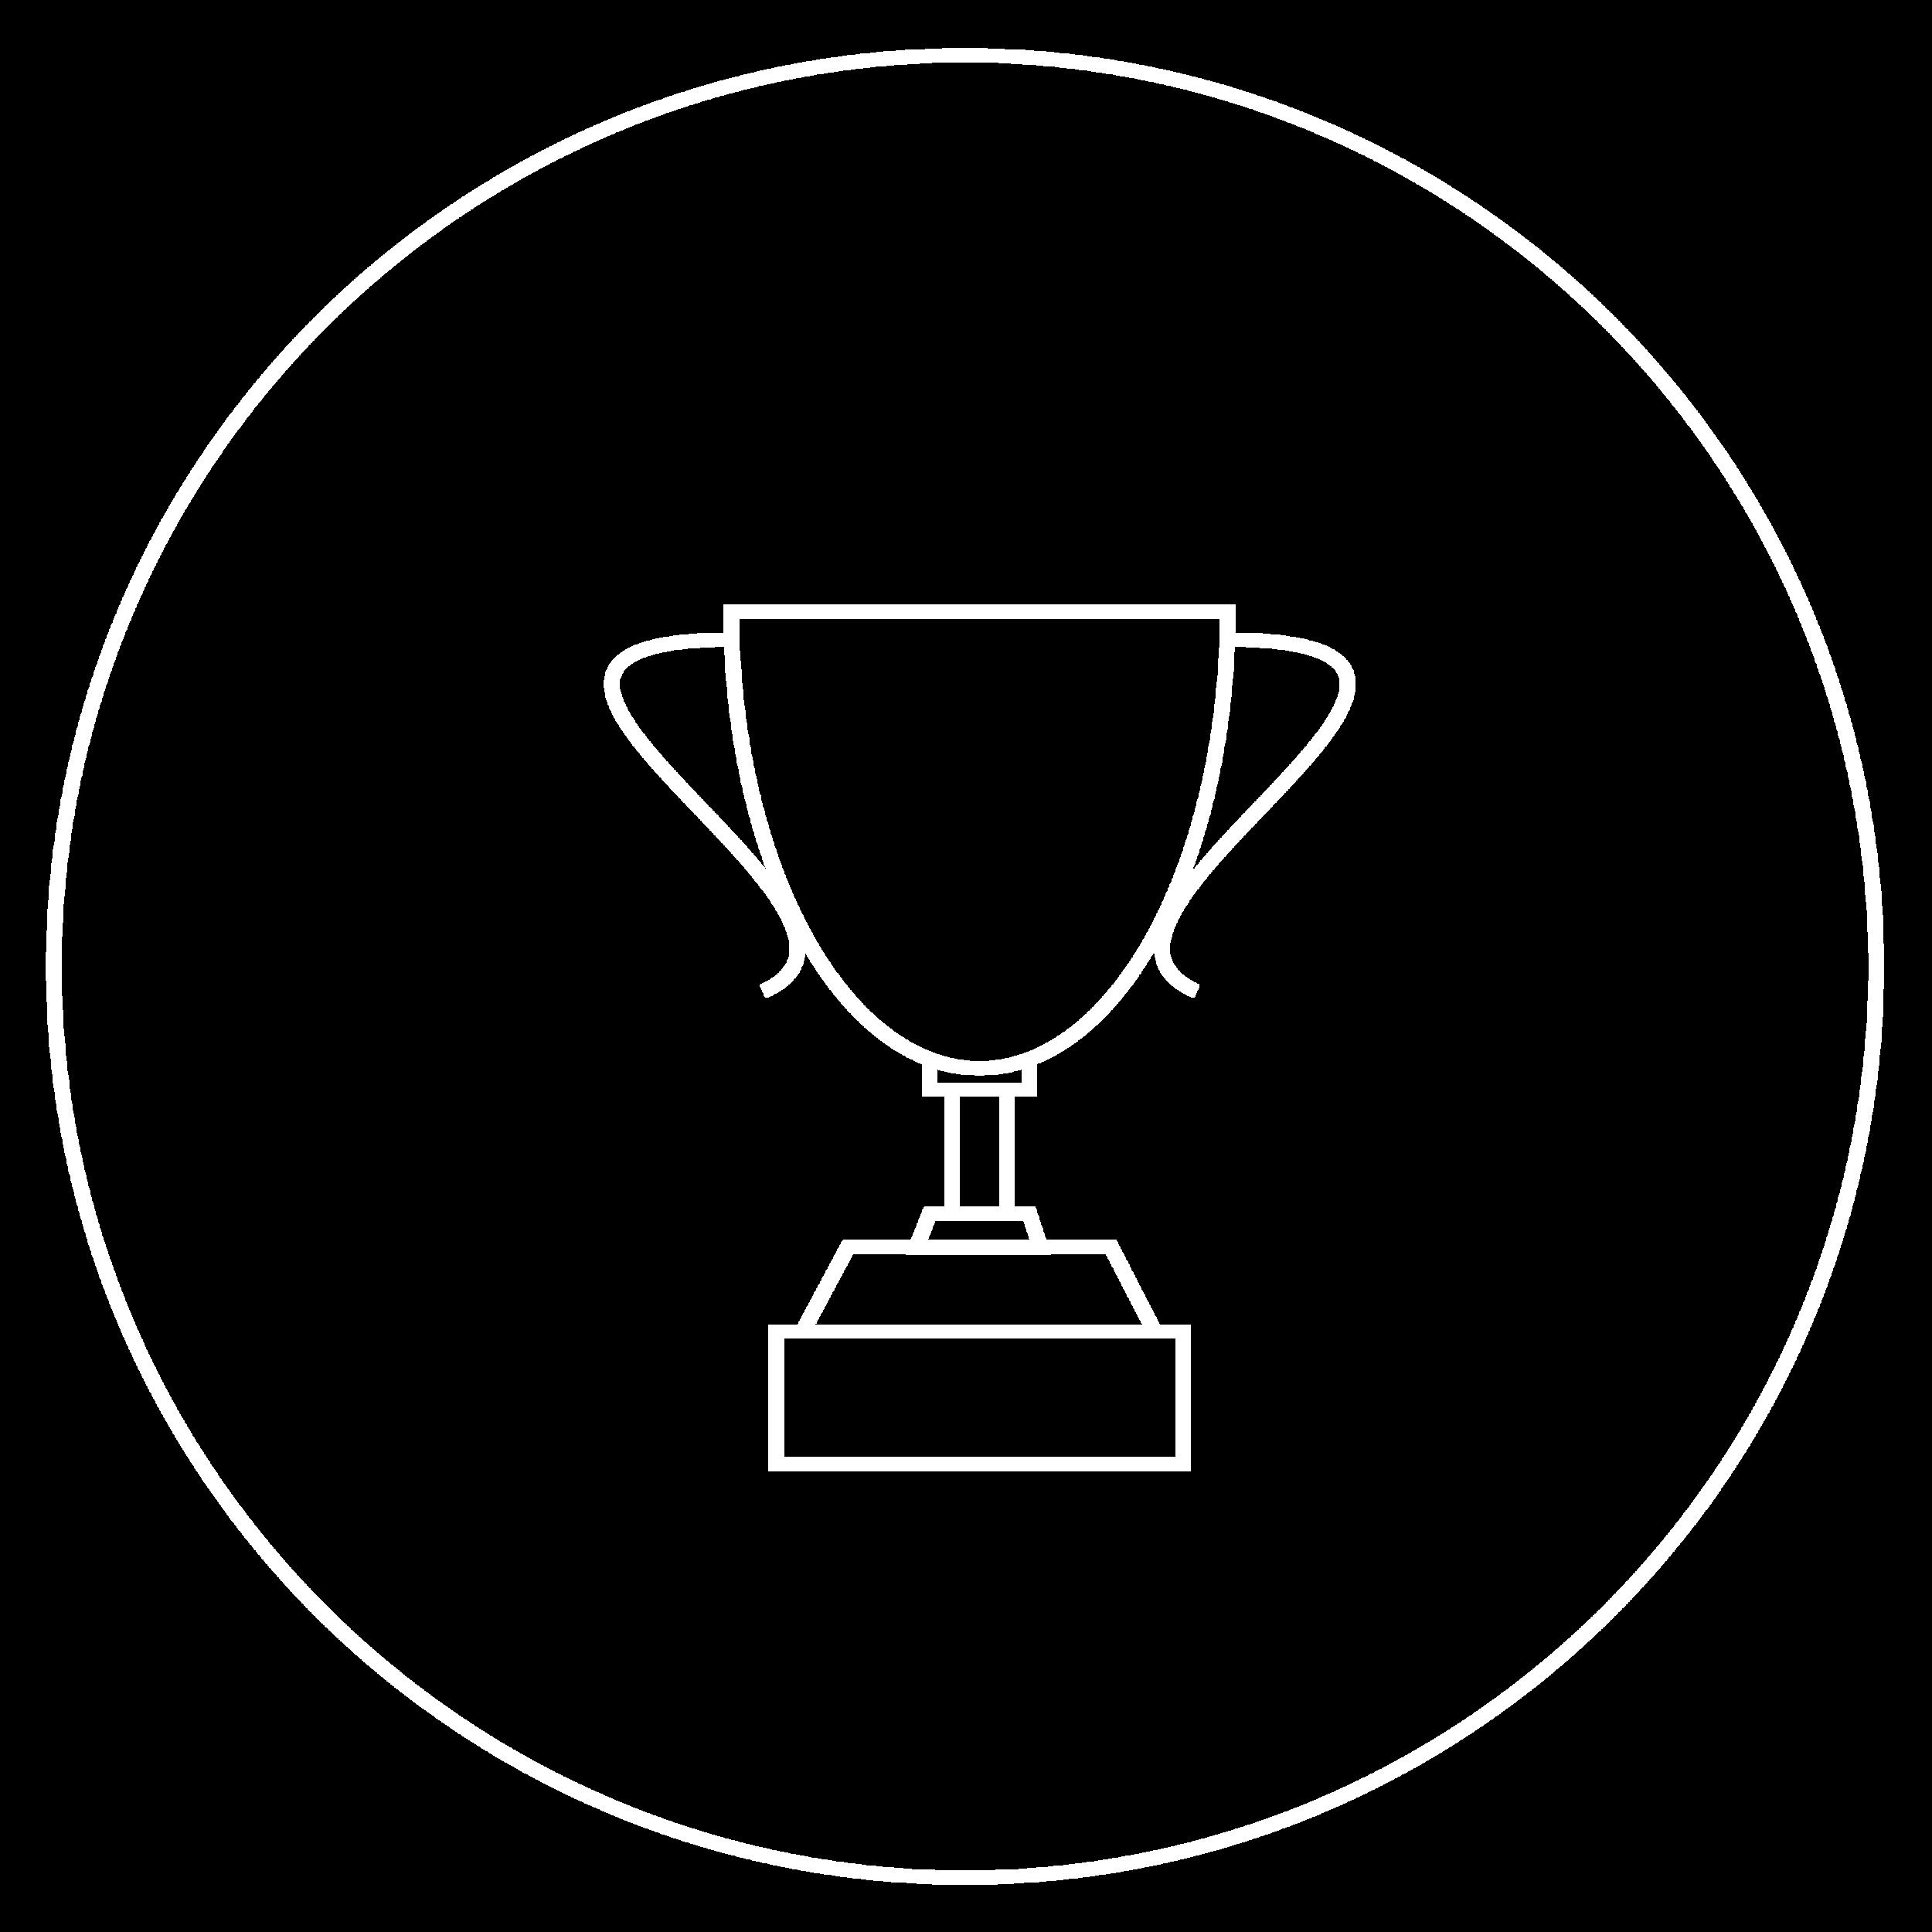 AGC NM Best Building Award, 1994